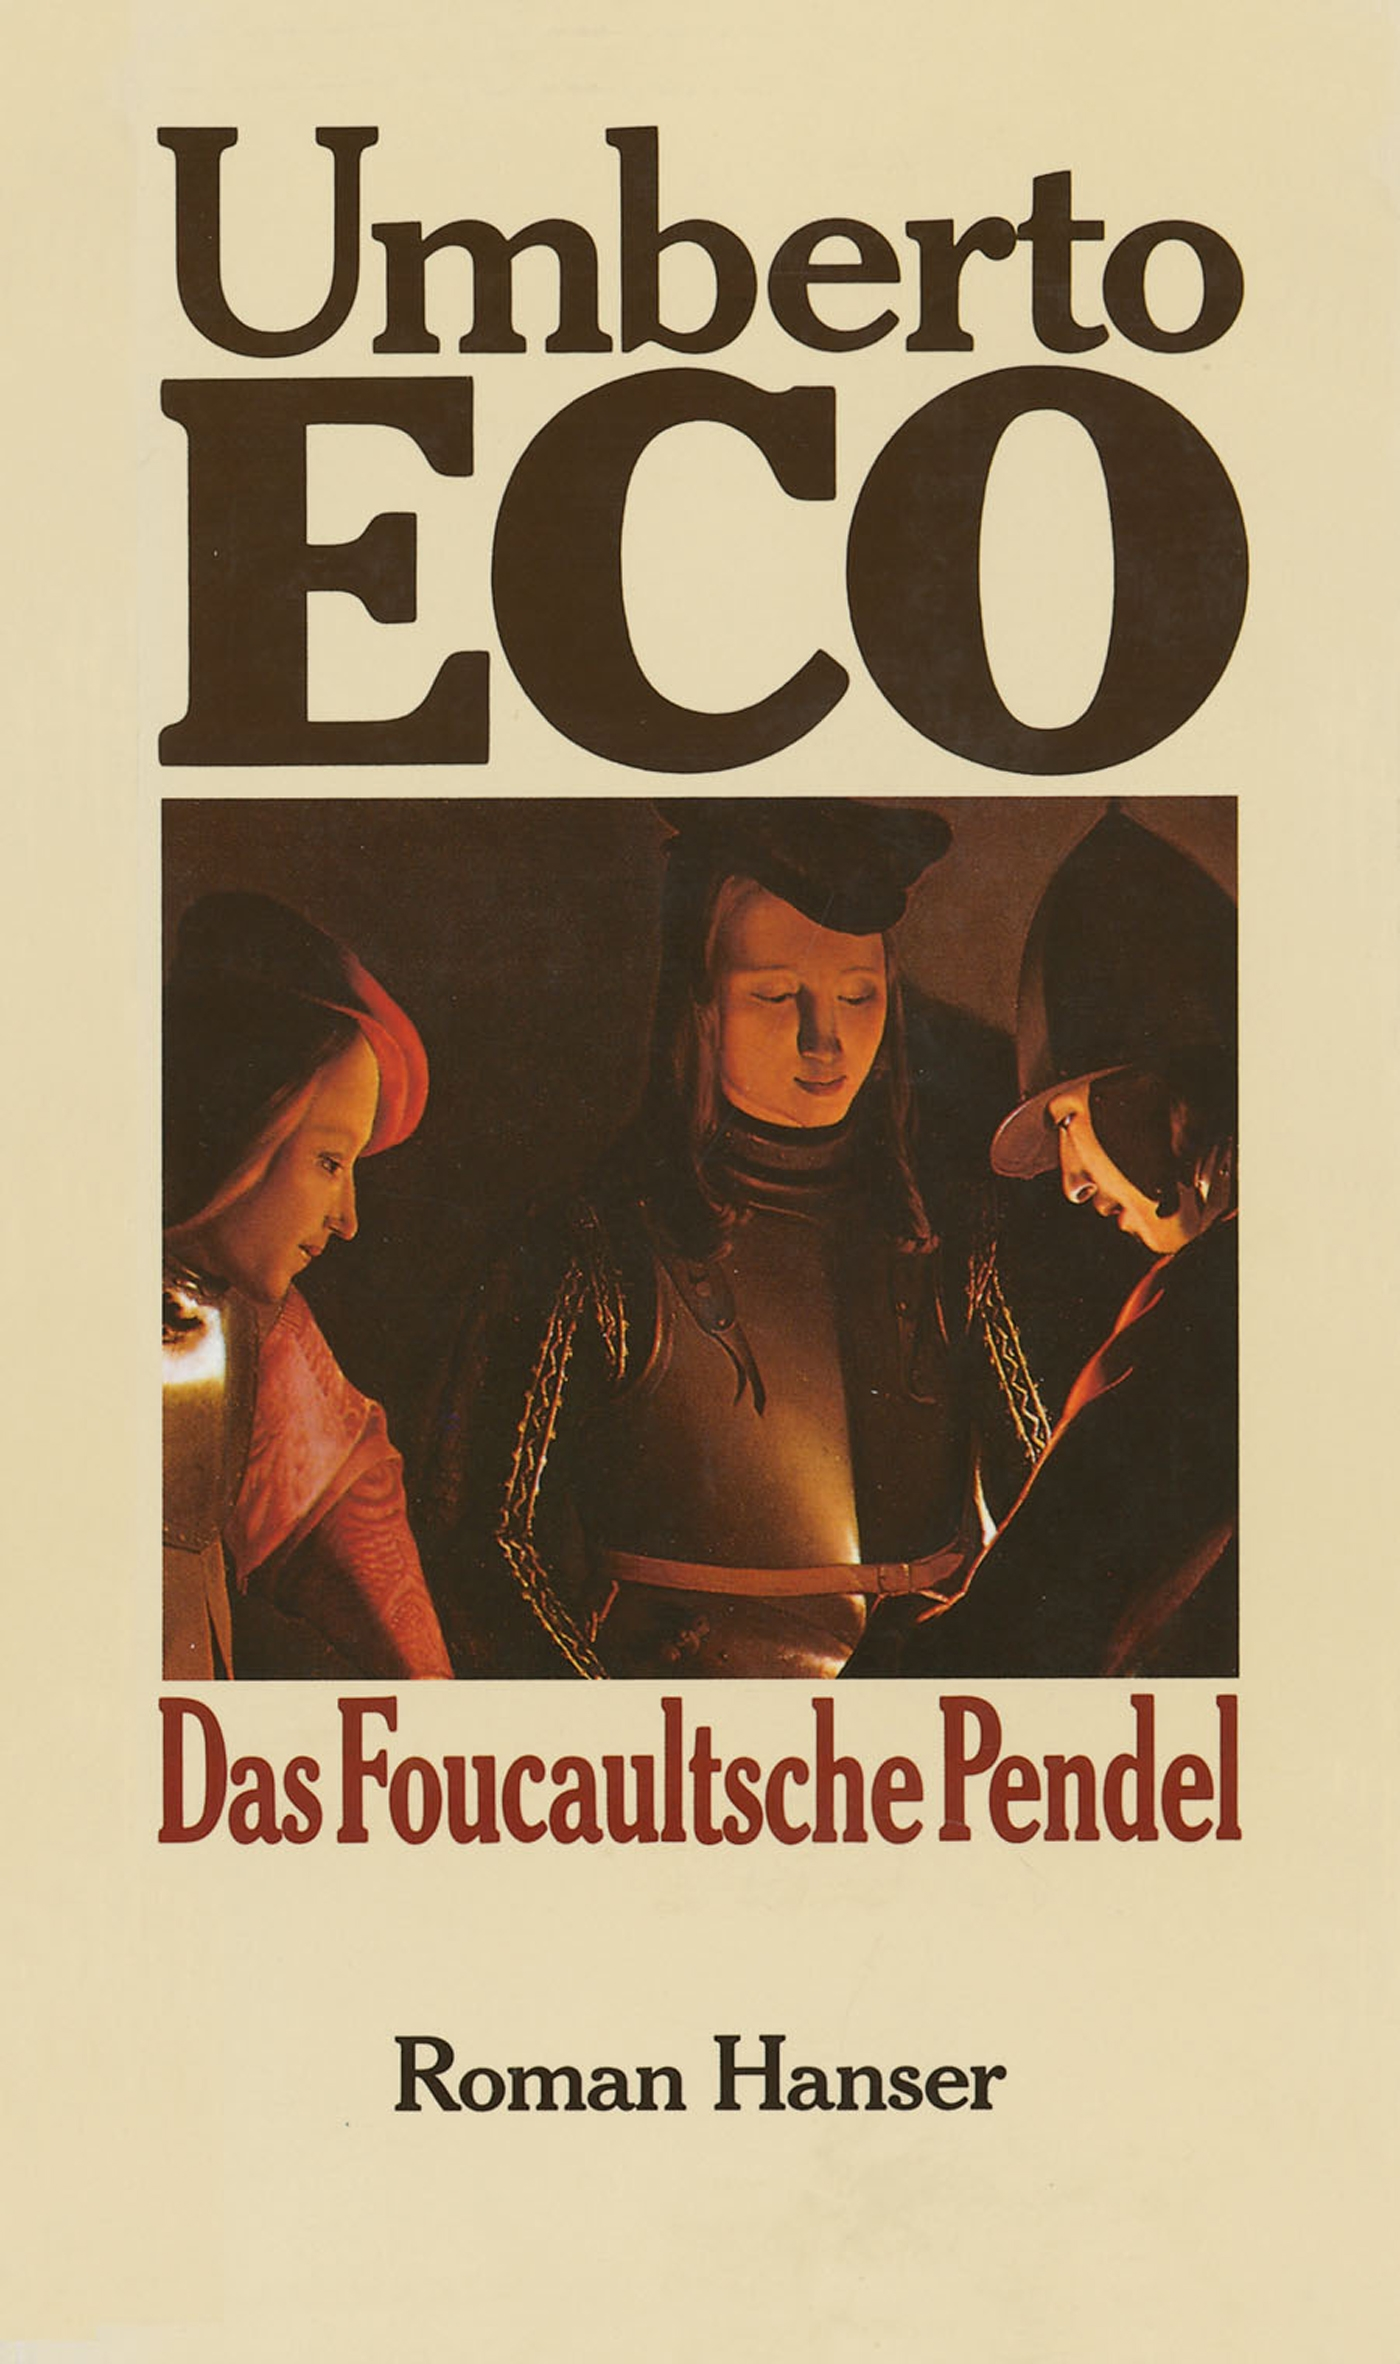 Das Foucaultsche Pendel